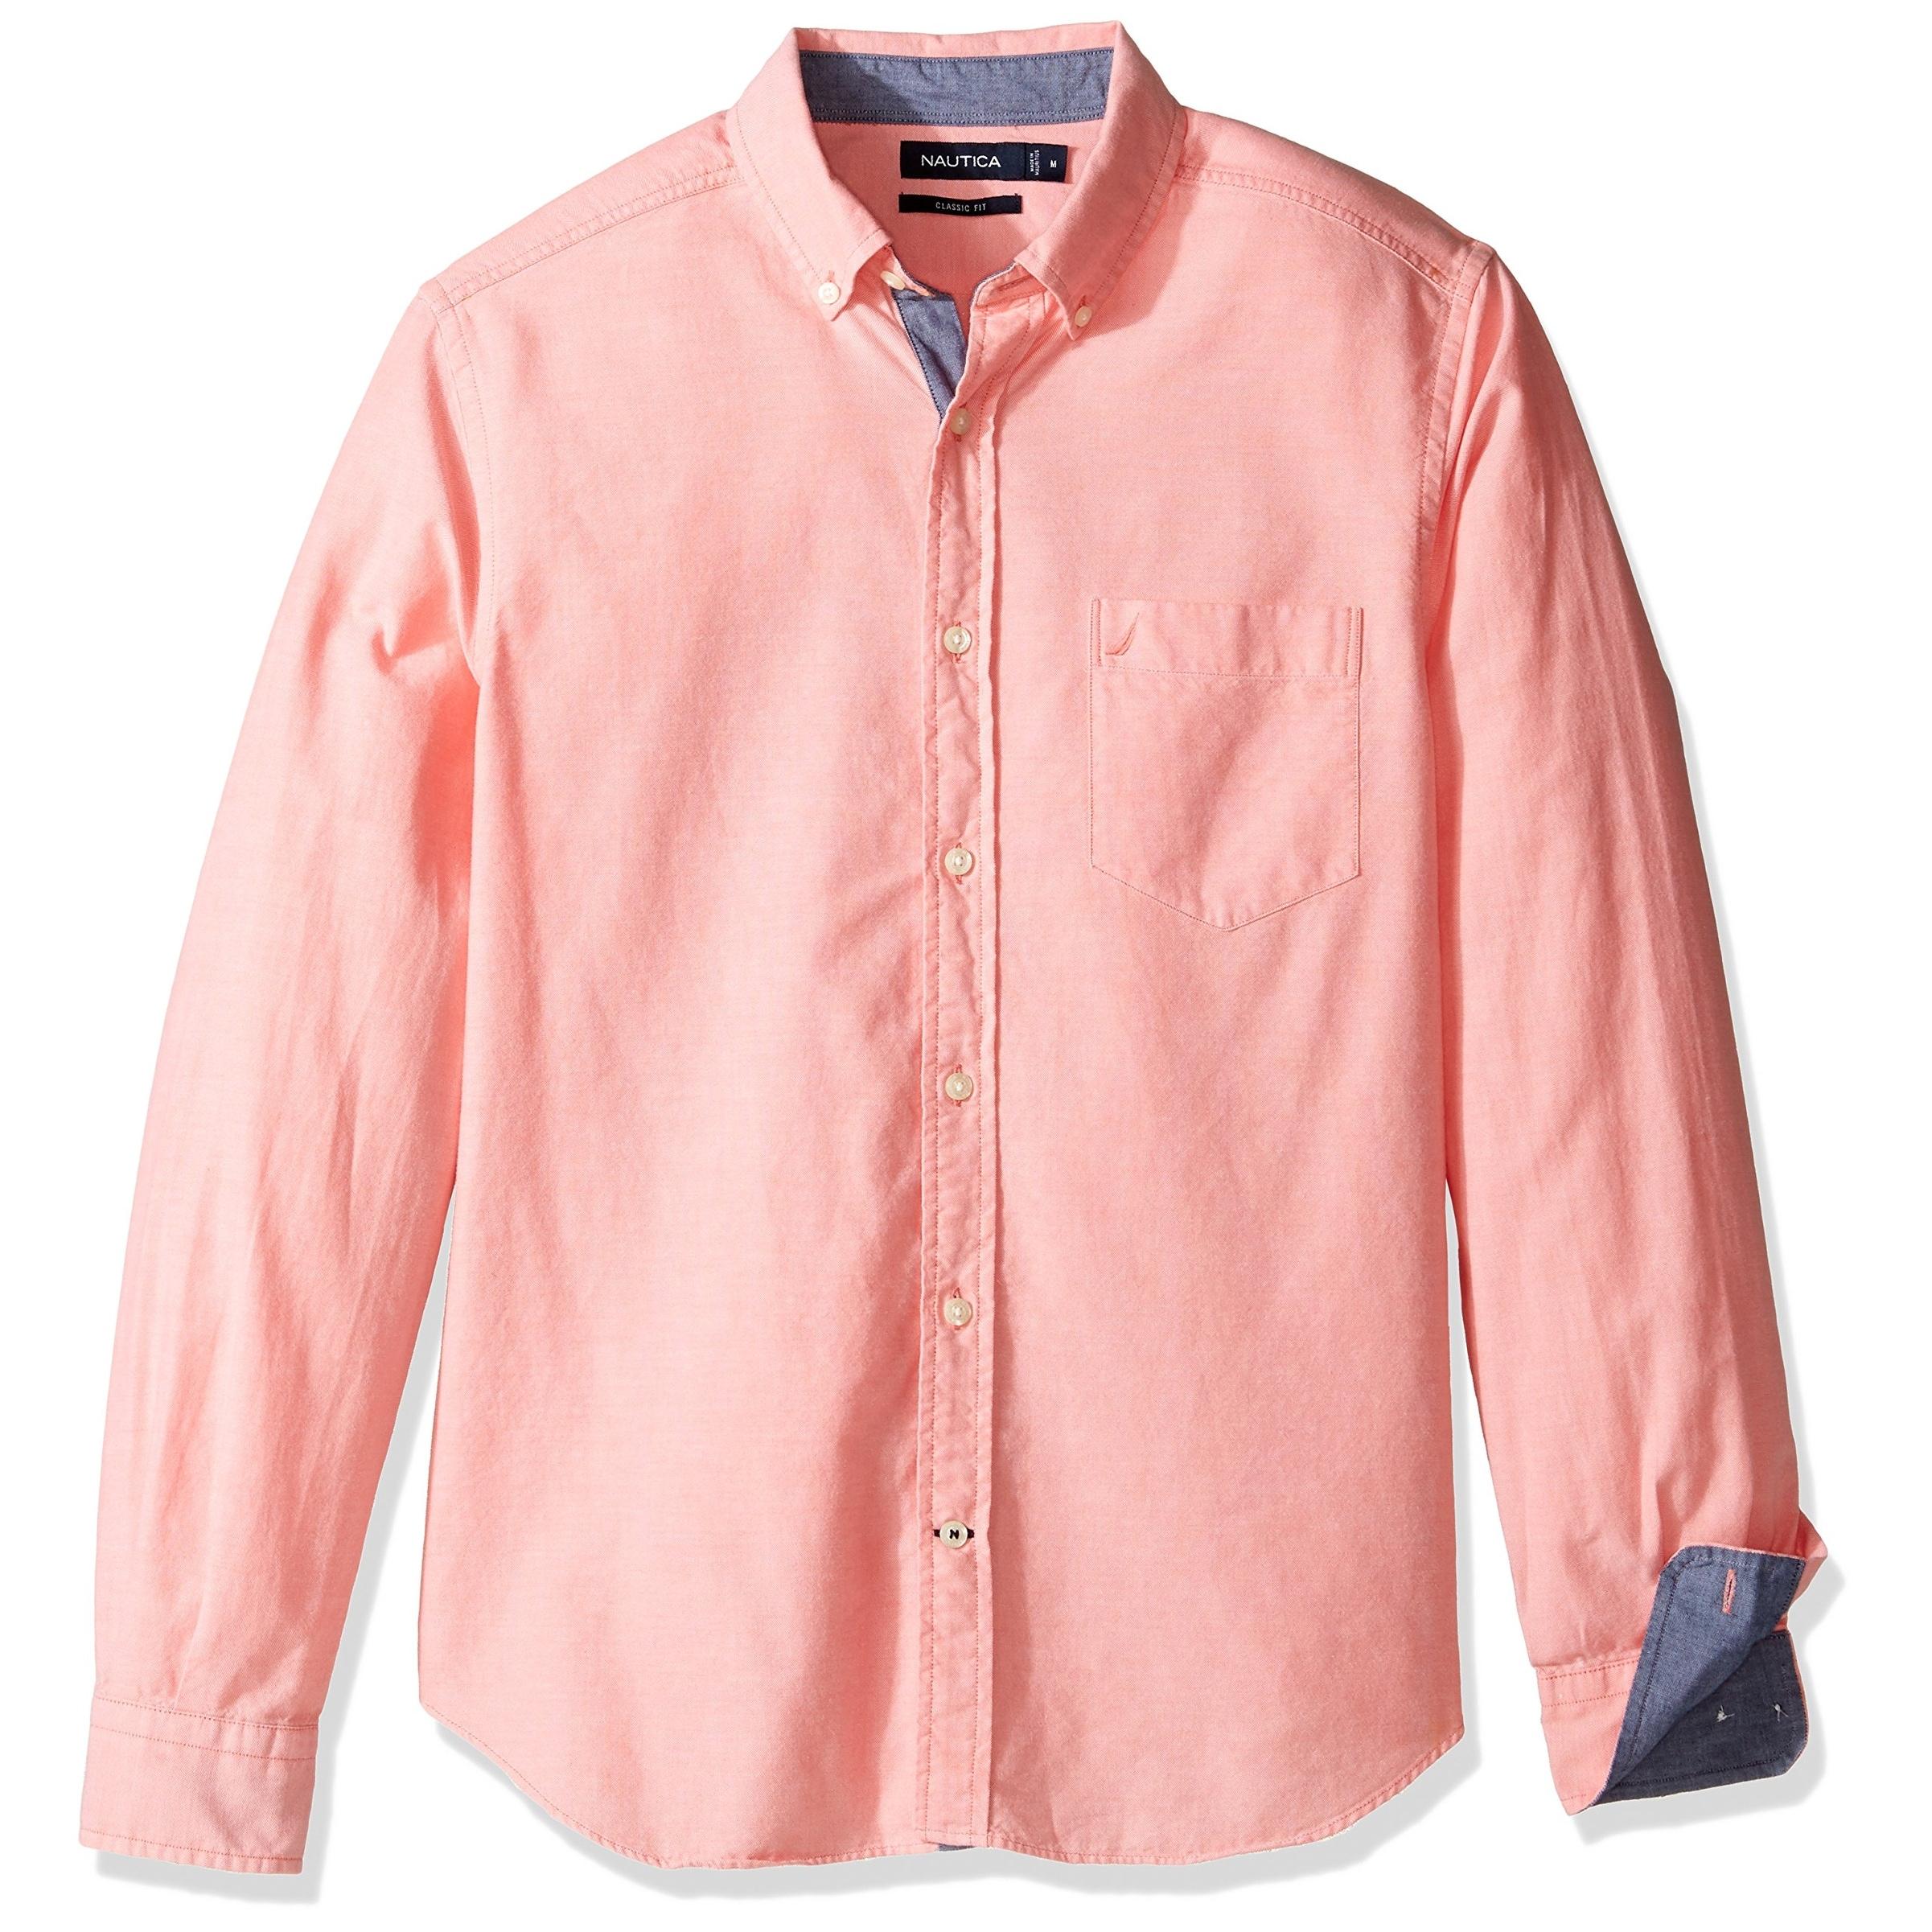 Shop Nautica New Pale Coral Pink Mens Size 2xl Button Down Oxford